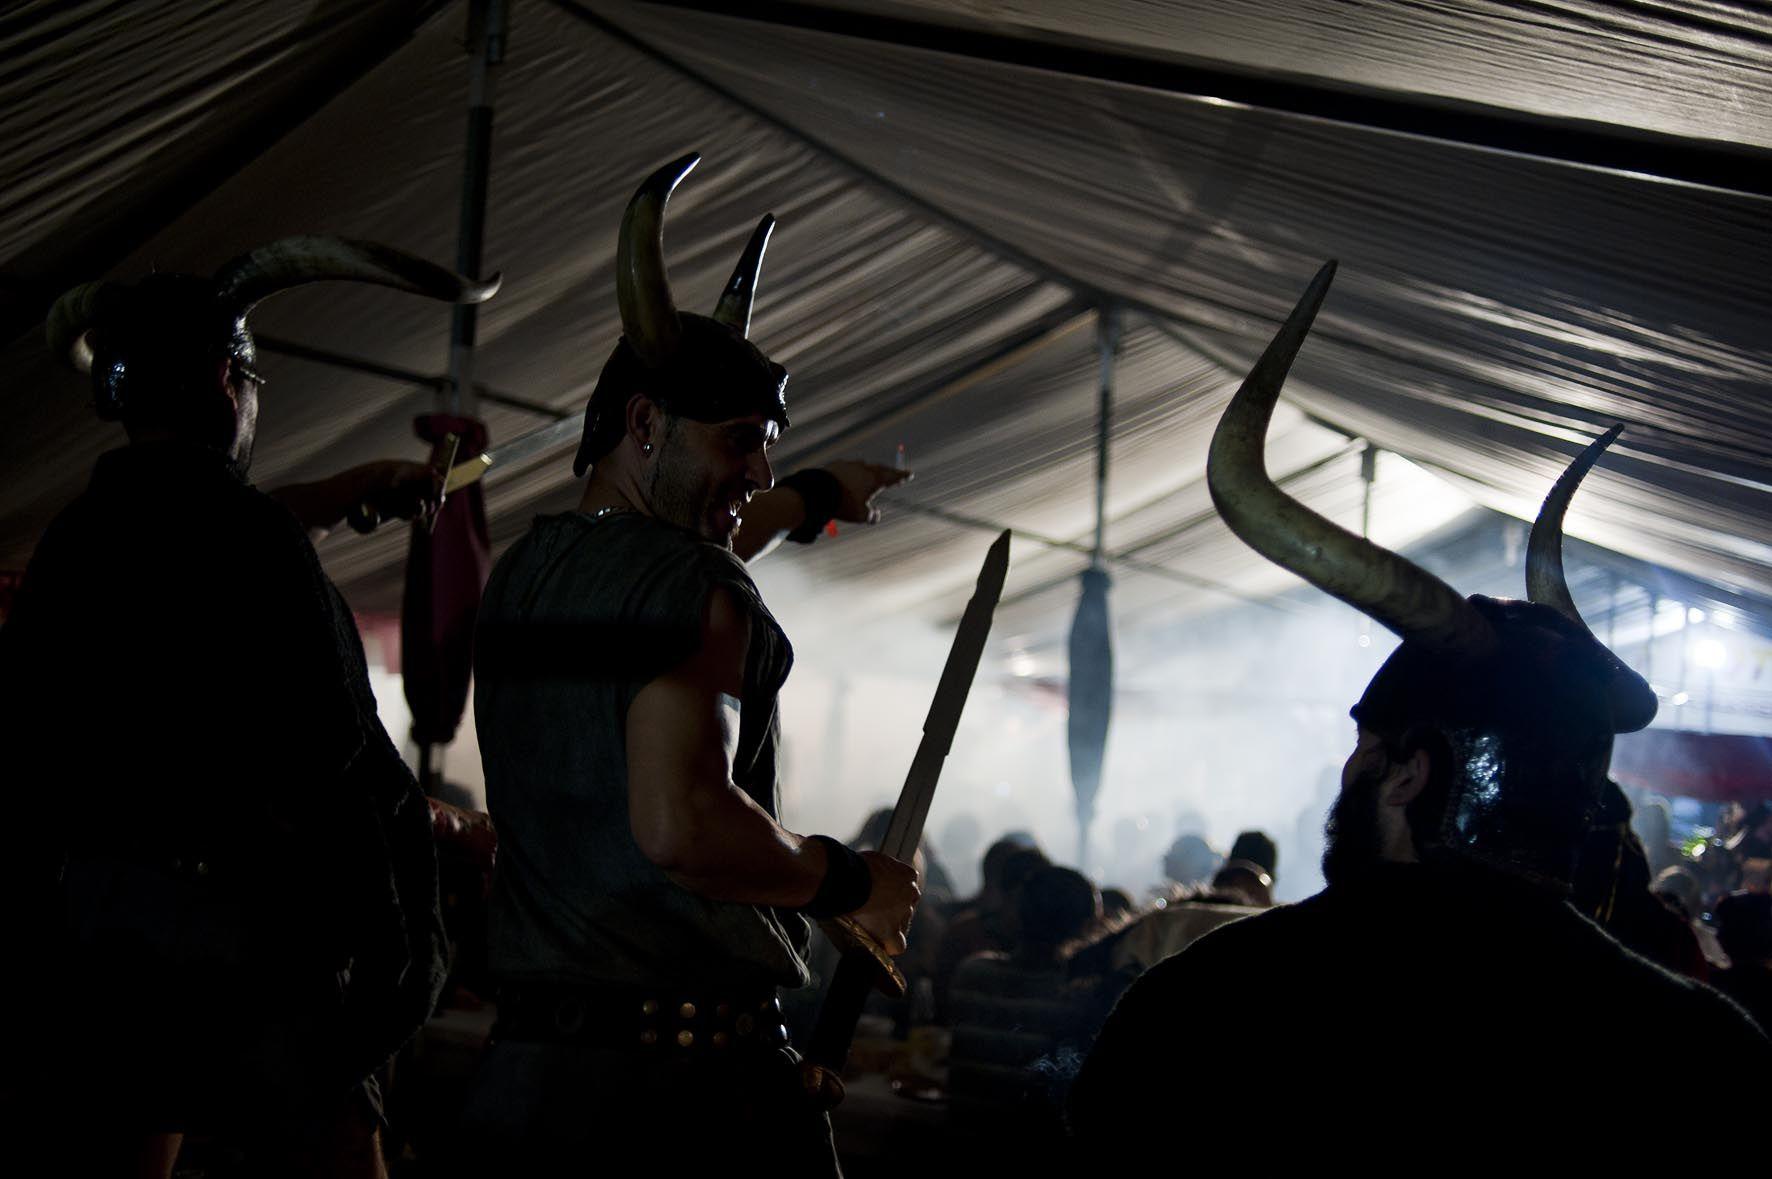 Romería Vikinga Catoira Pontevedra